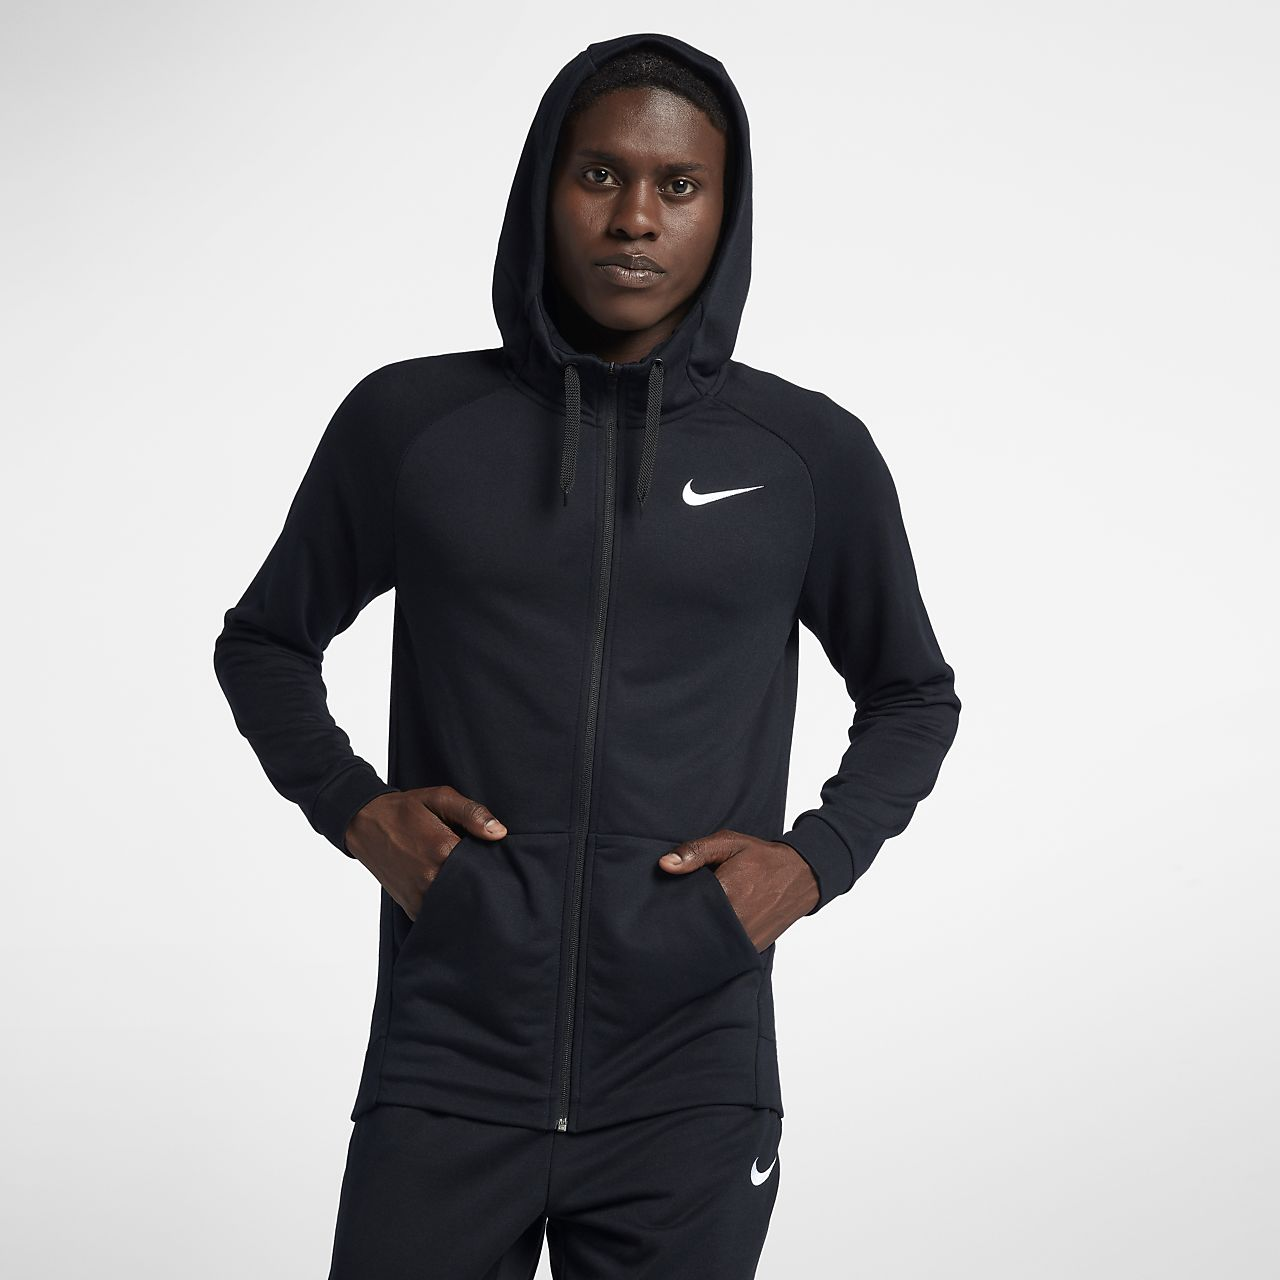 Cremallera De Sudadera Nike Capucha Con Fit Entrenamiento Dri ww68t0